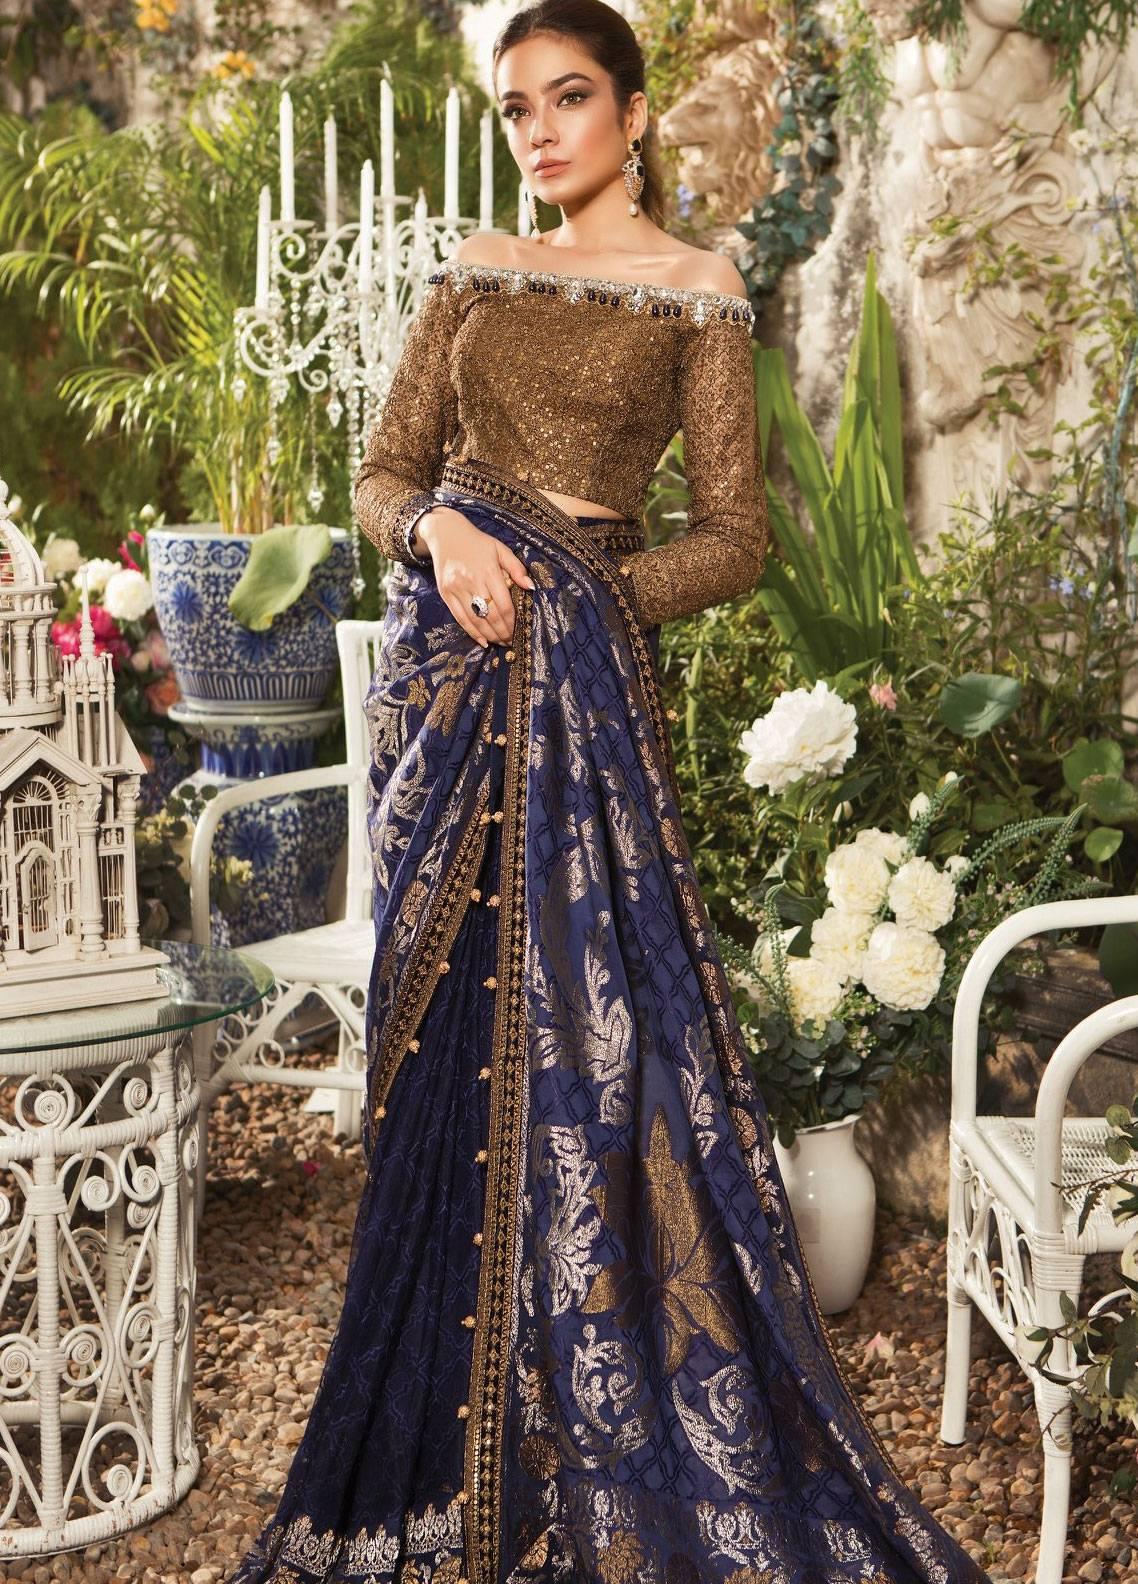 Maria B Embroidered Zari Net Unstitched Saree MB19E 1601 - Eid Collection